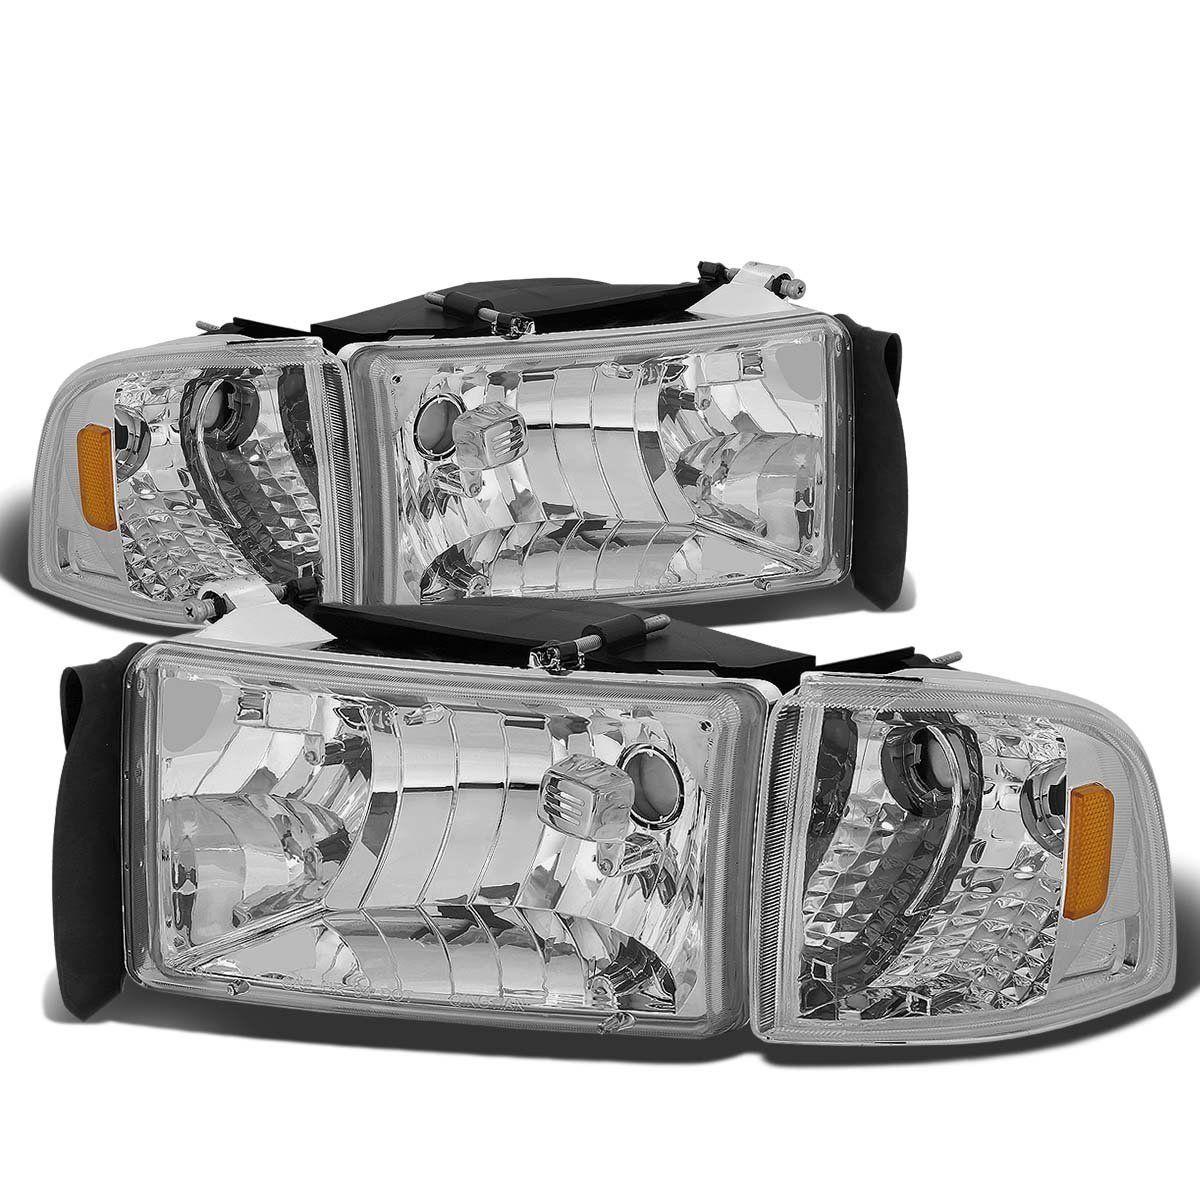 94 01 Dodge Ram 1500 2500 3500 Oem Style Crystal Headlights Chrome Dodge Ram Dodge Headlights